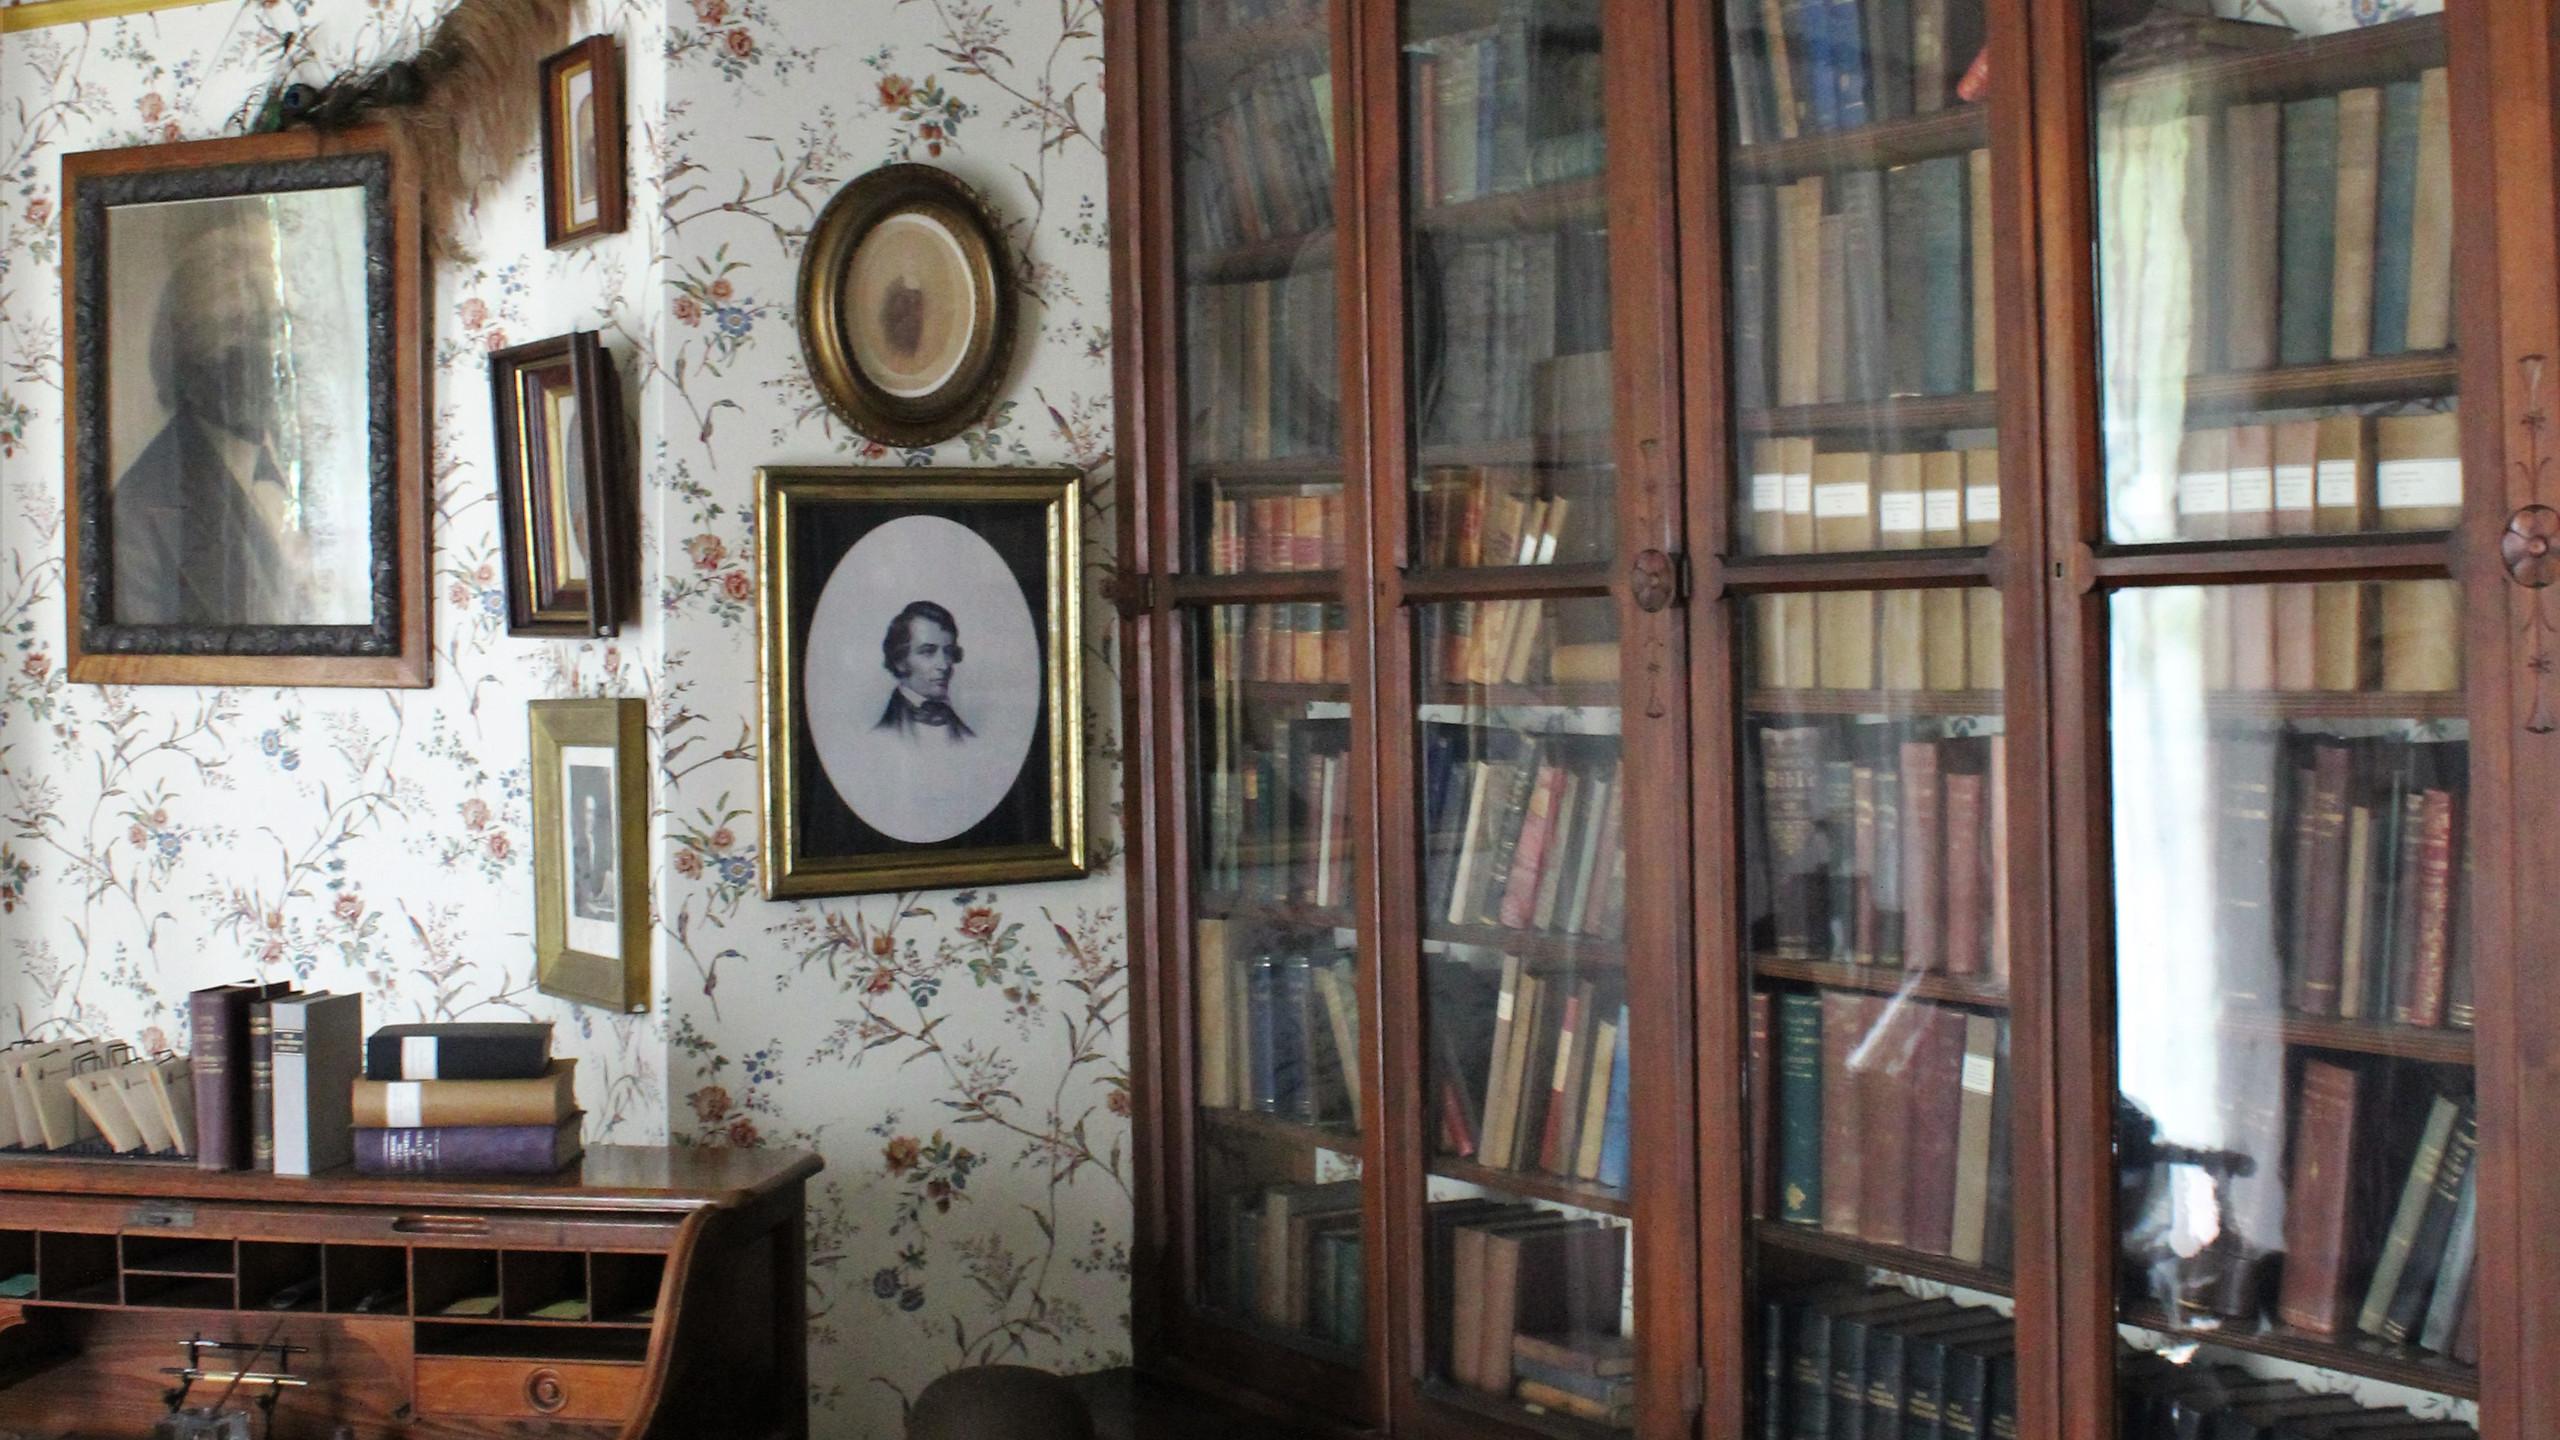 Douglass's Cabinet of Books